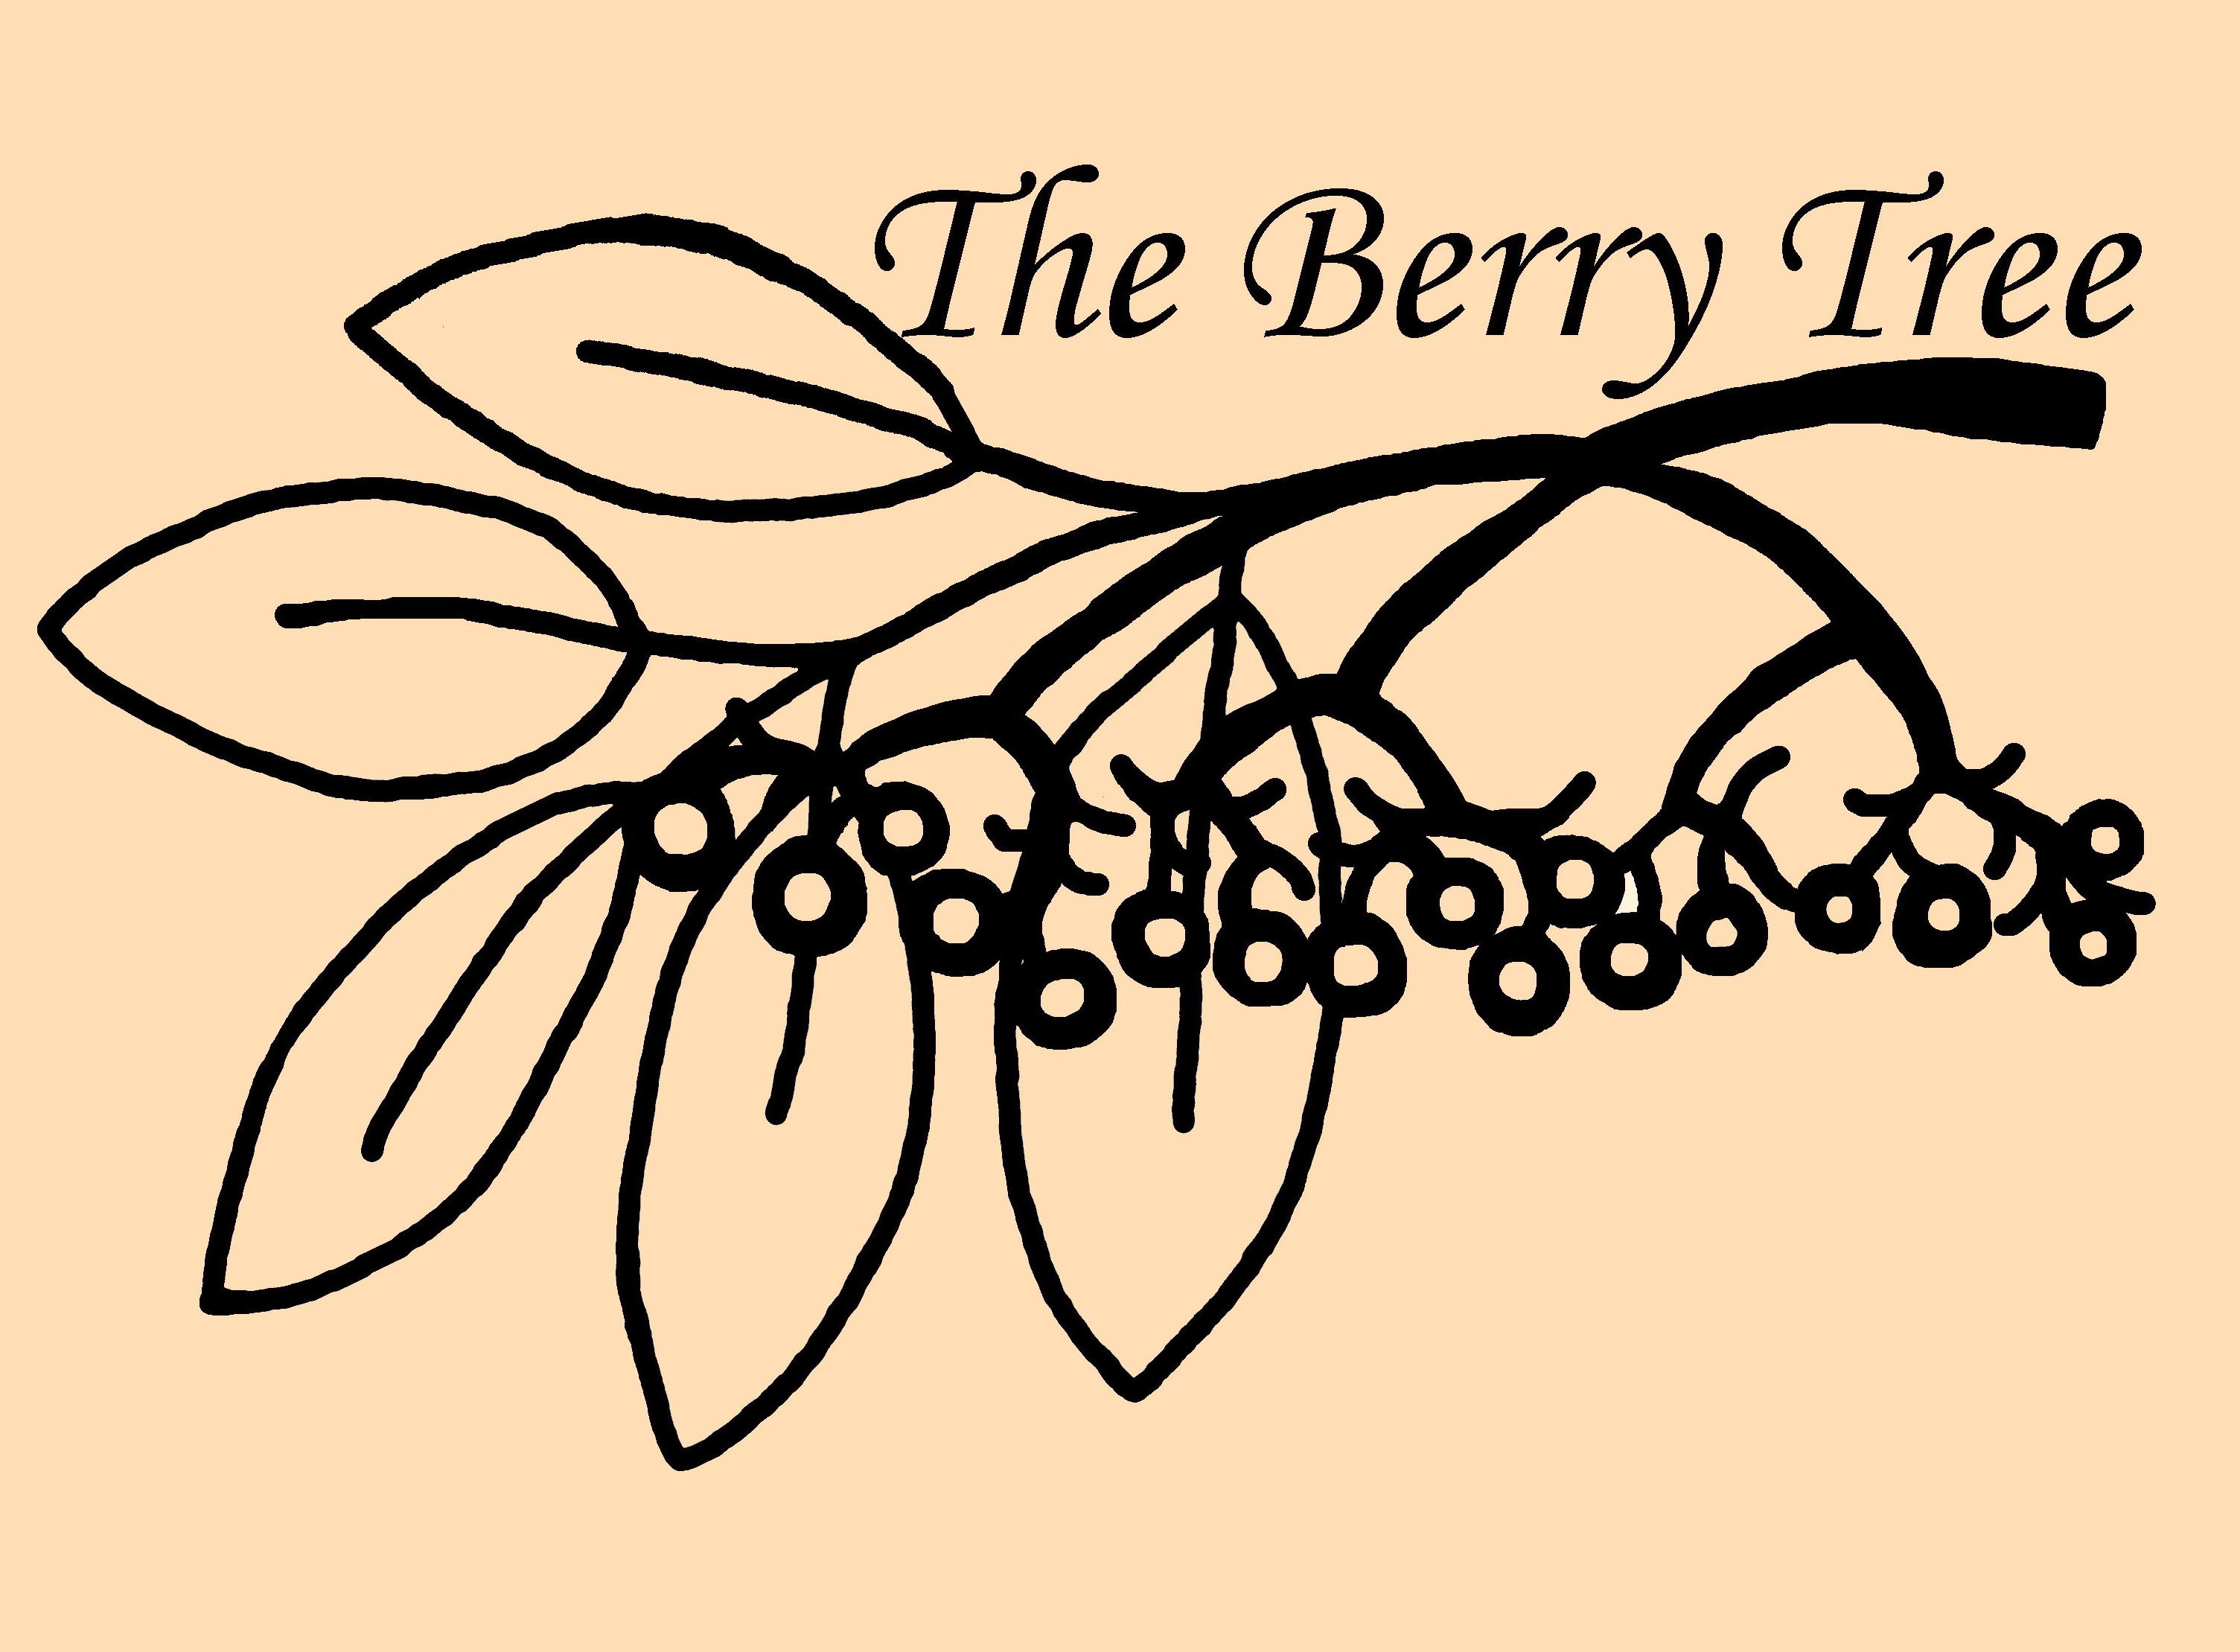 The Berry Tree